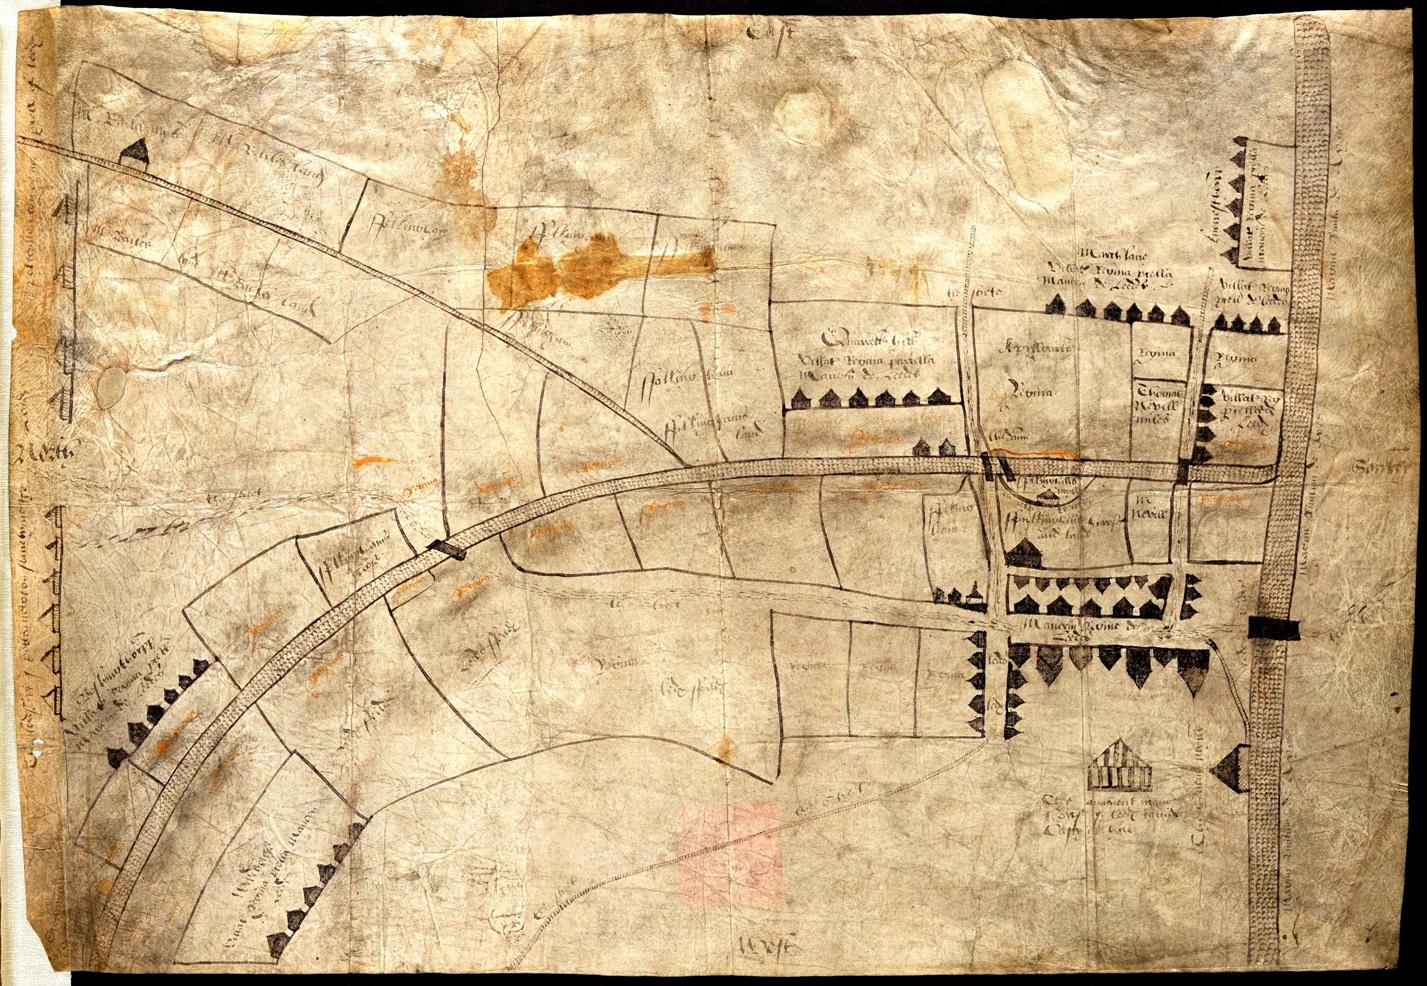 FIRST MAP OF LEEDS